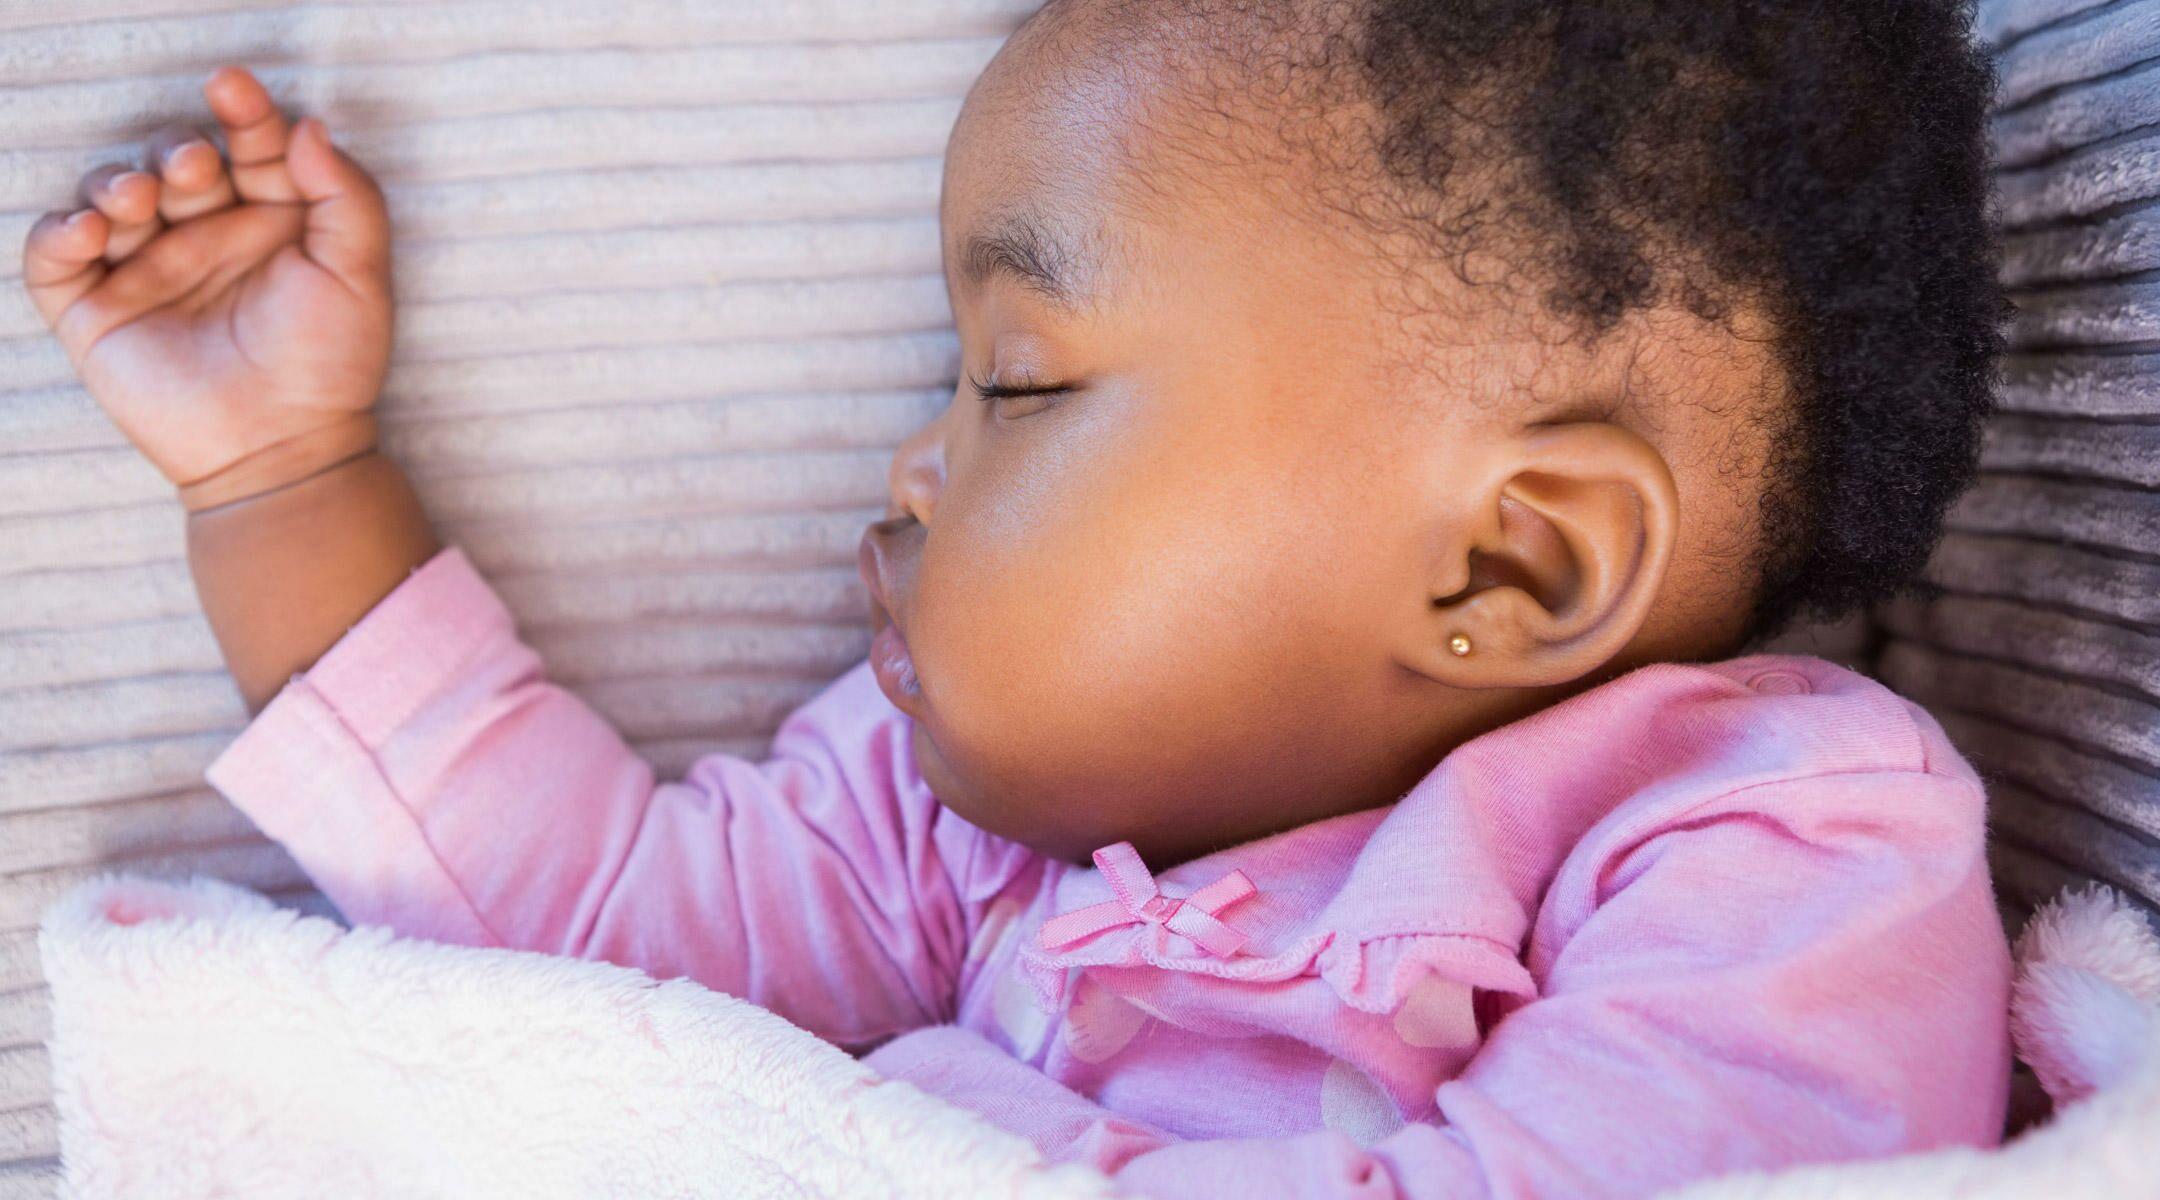 When Should Baby Drop a Nap?